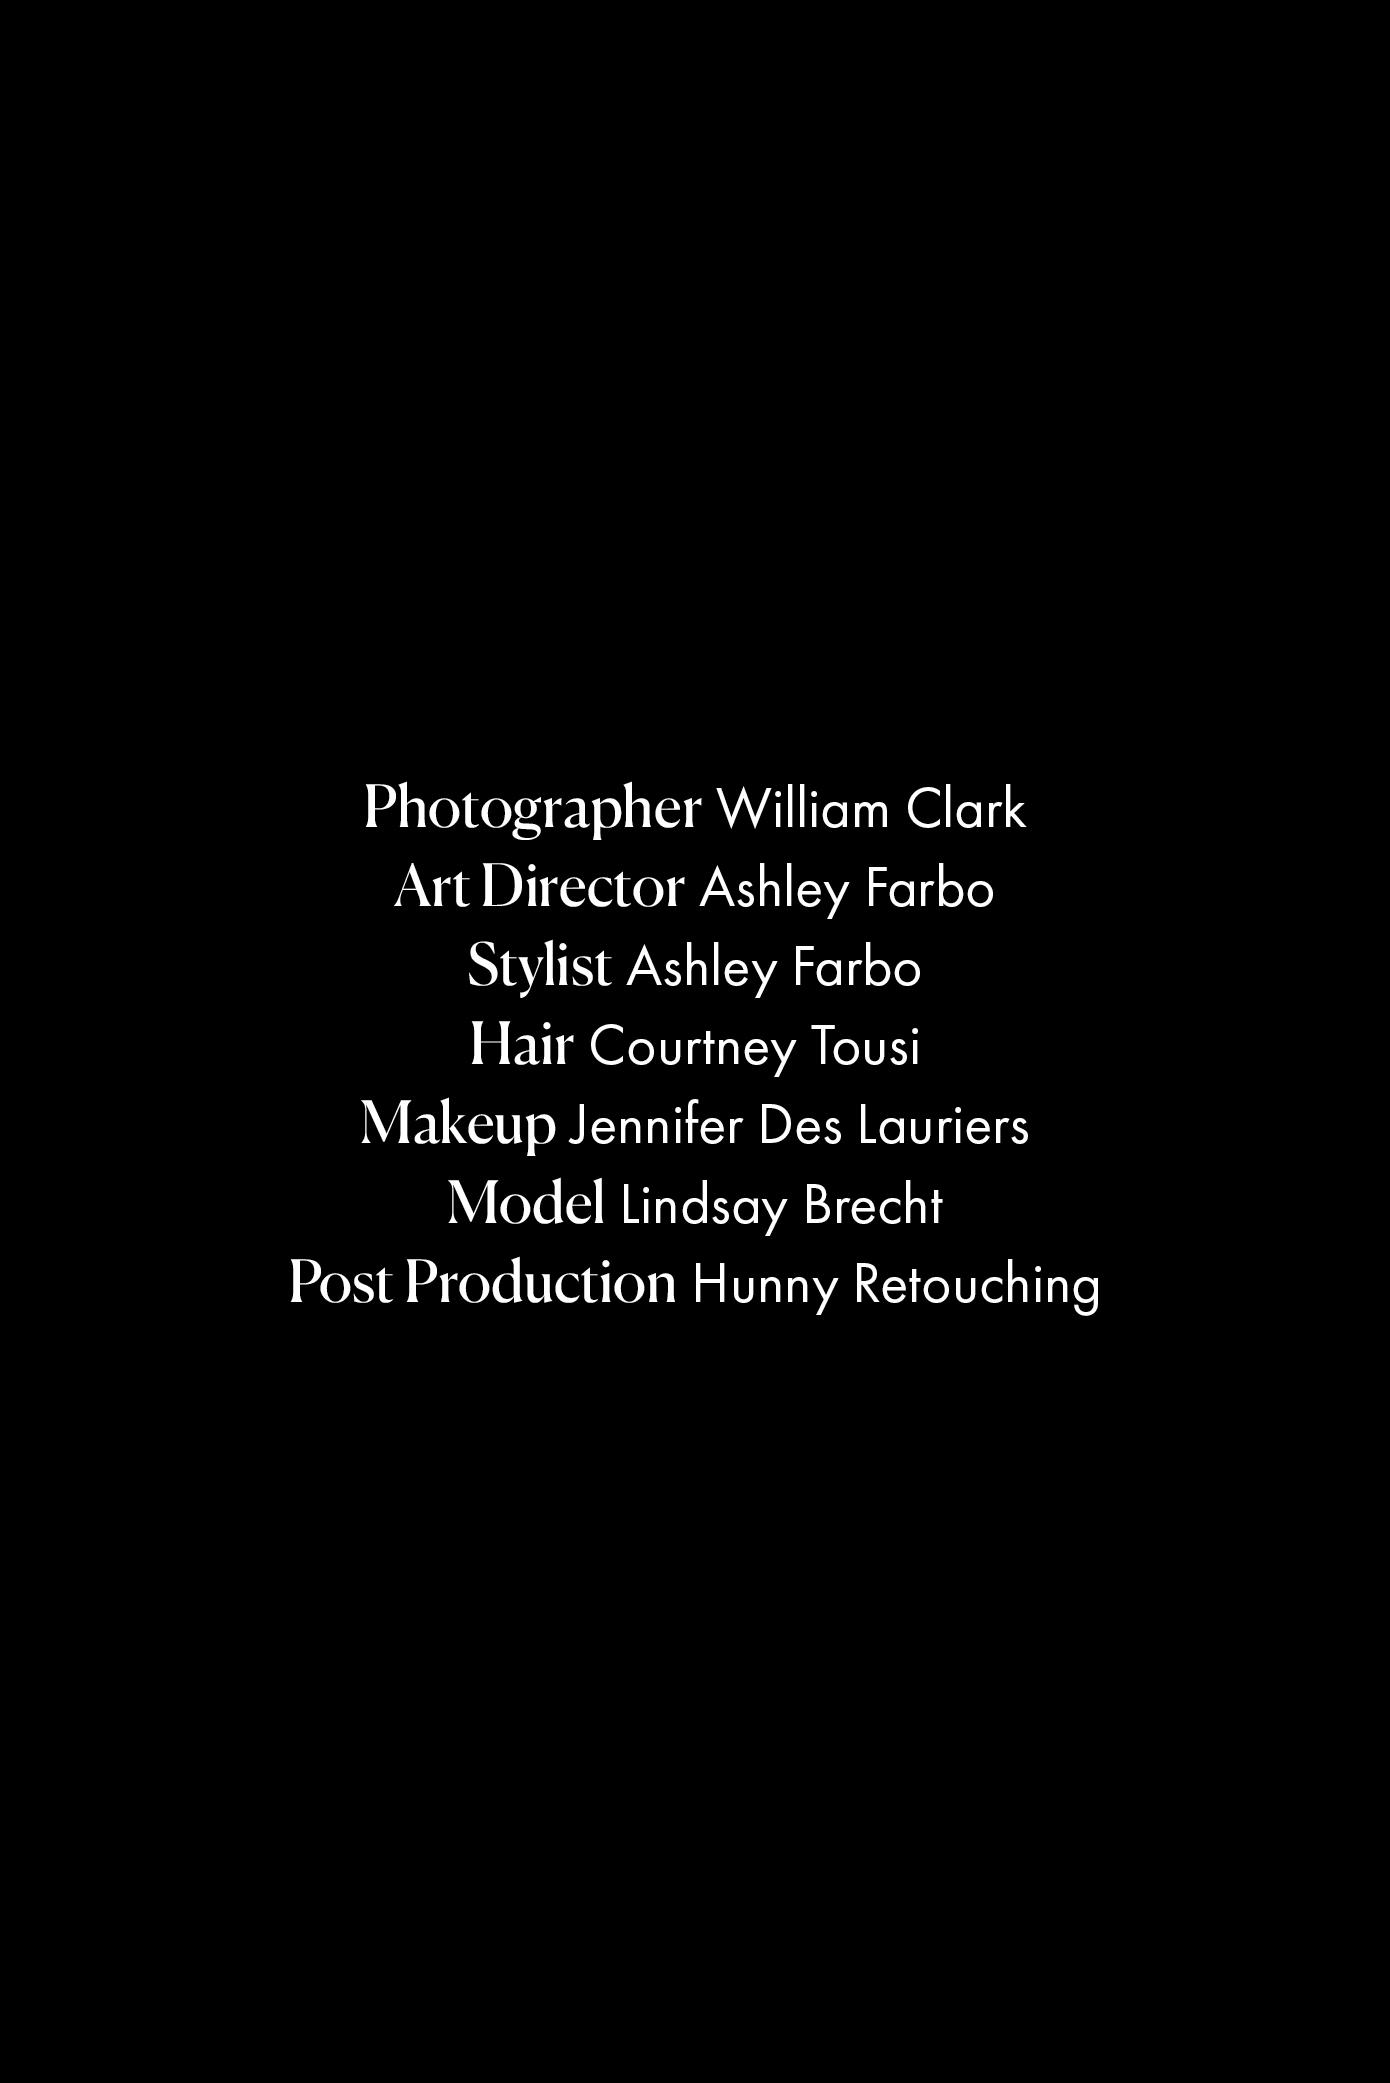 bespoke-credits